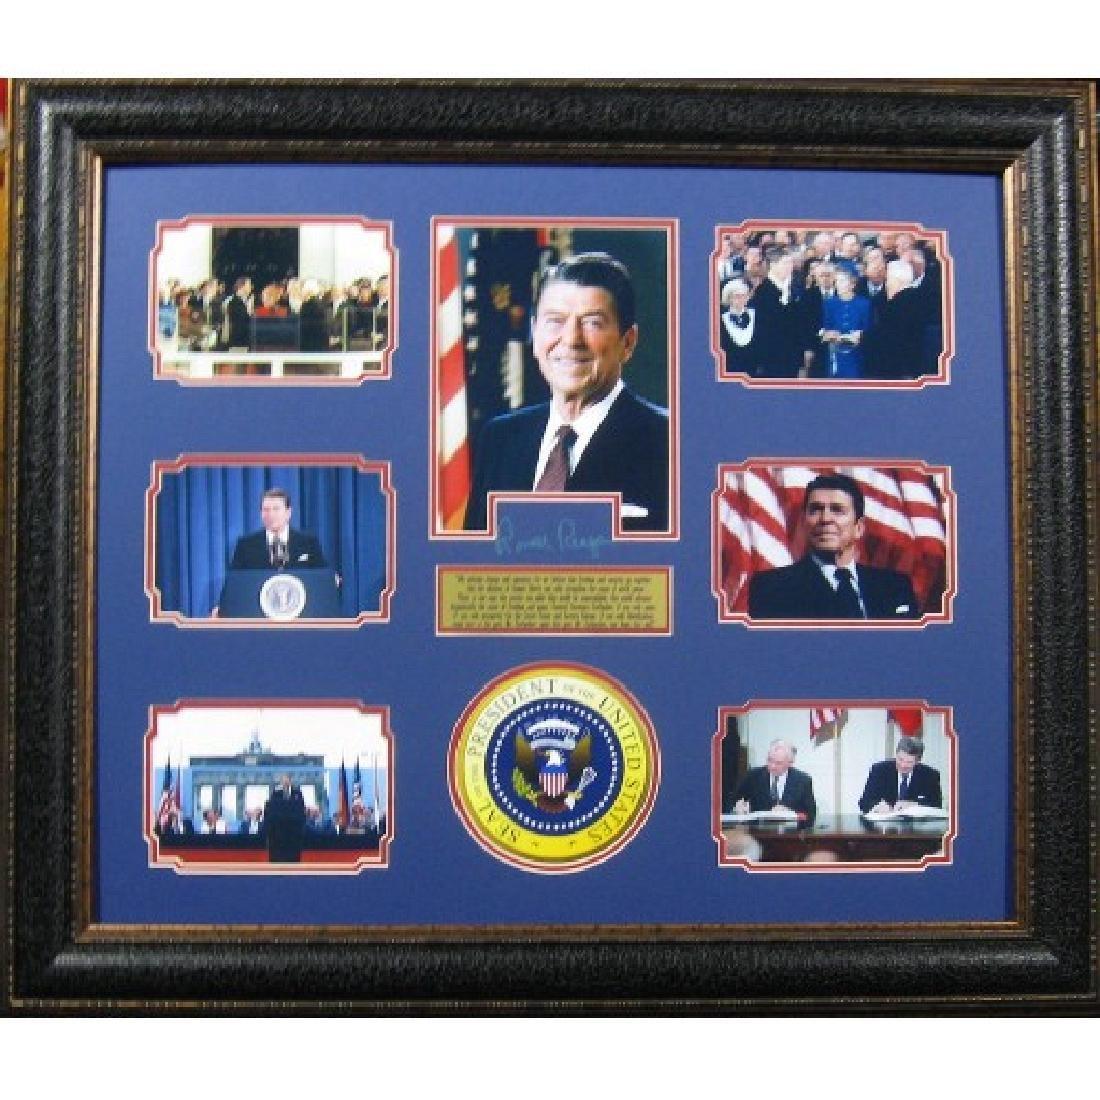 Ronald Reagan Wall Speech Engraved